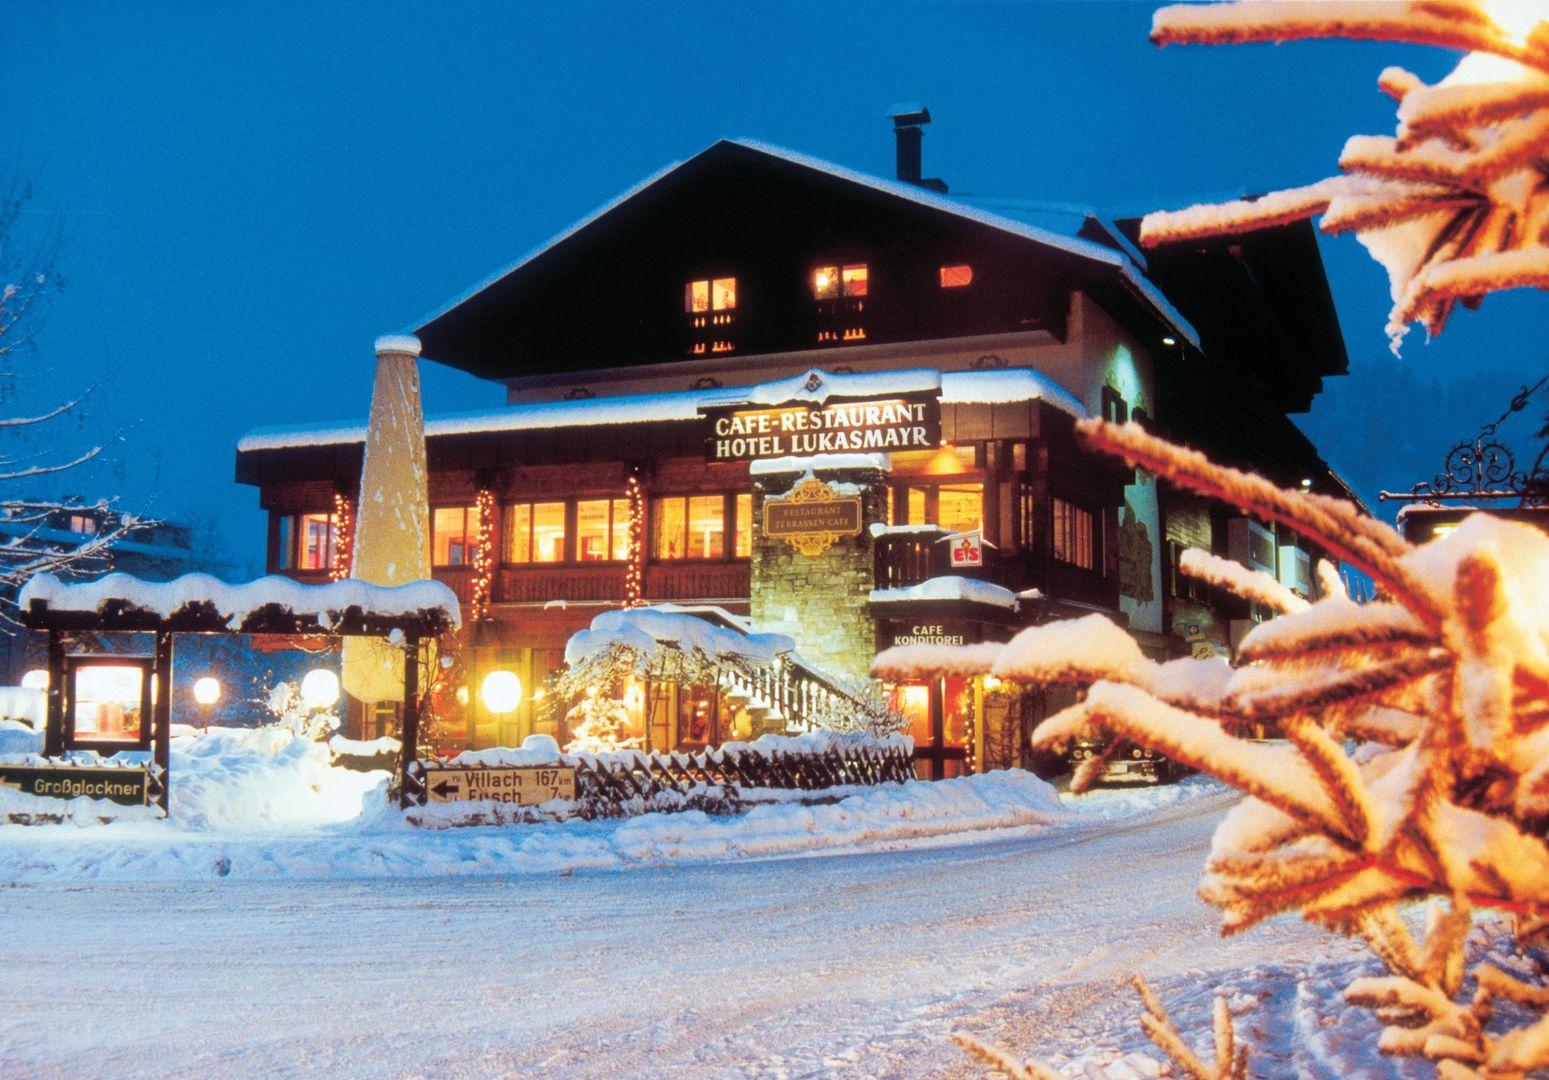 Hotel Lukasmayr - Slide 1